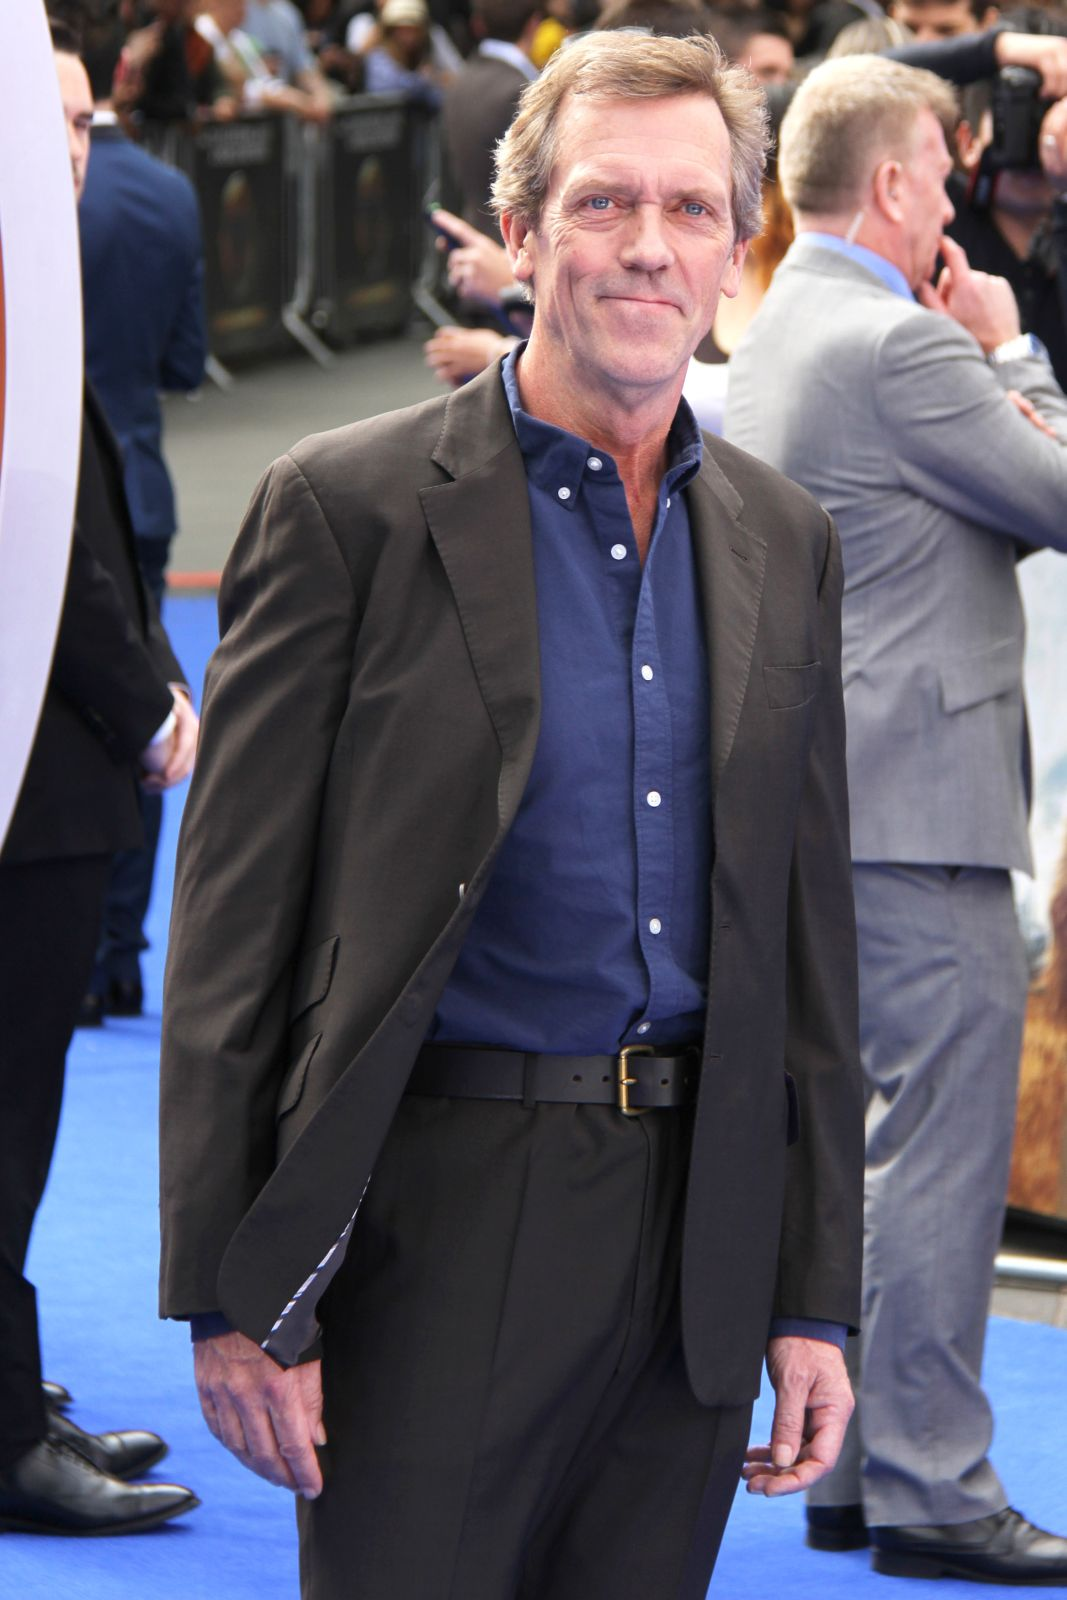 Hugh Laurie50 - Tomorrowland Premiere London 2015.jpg